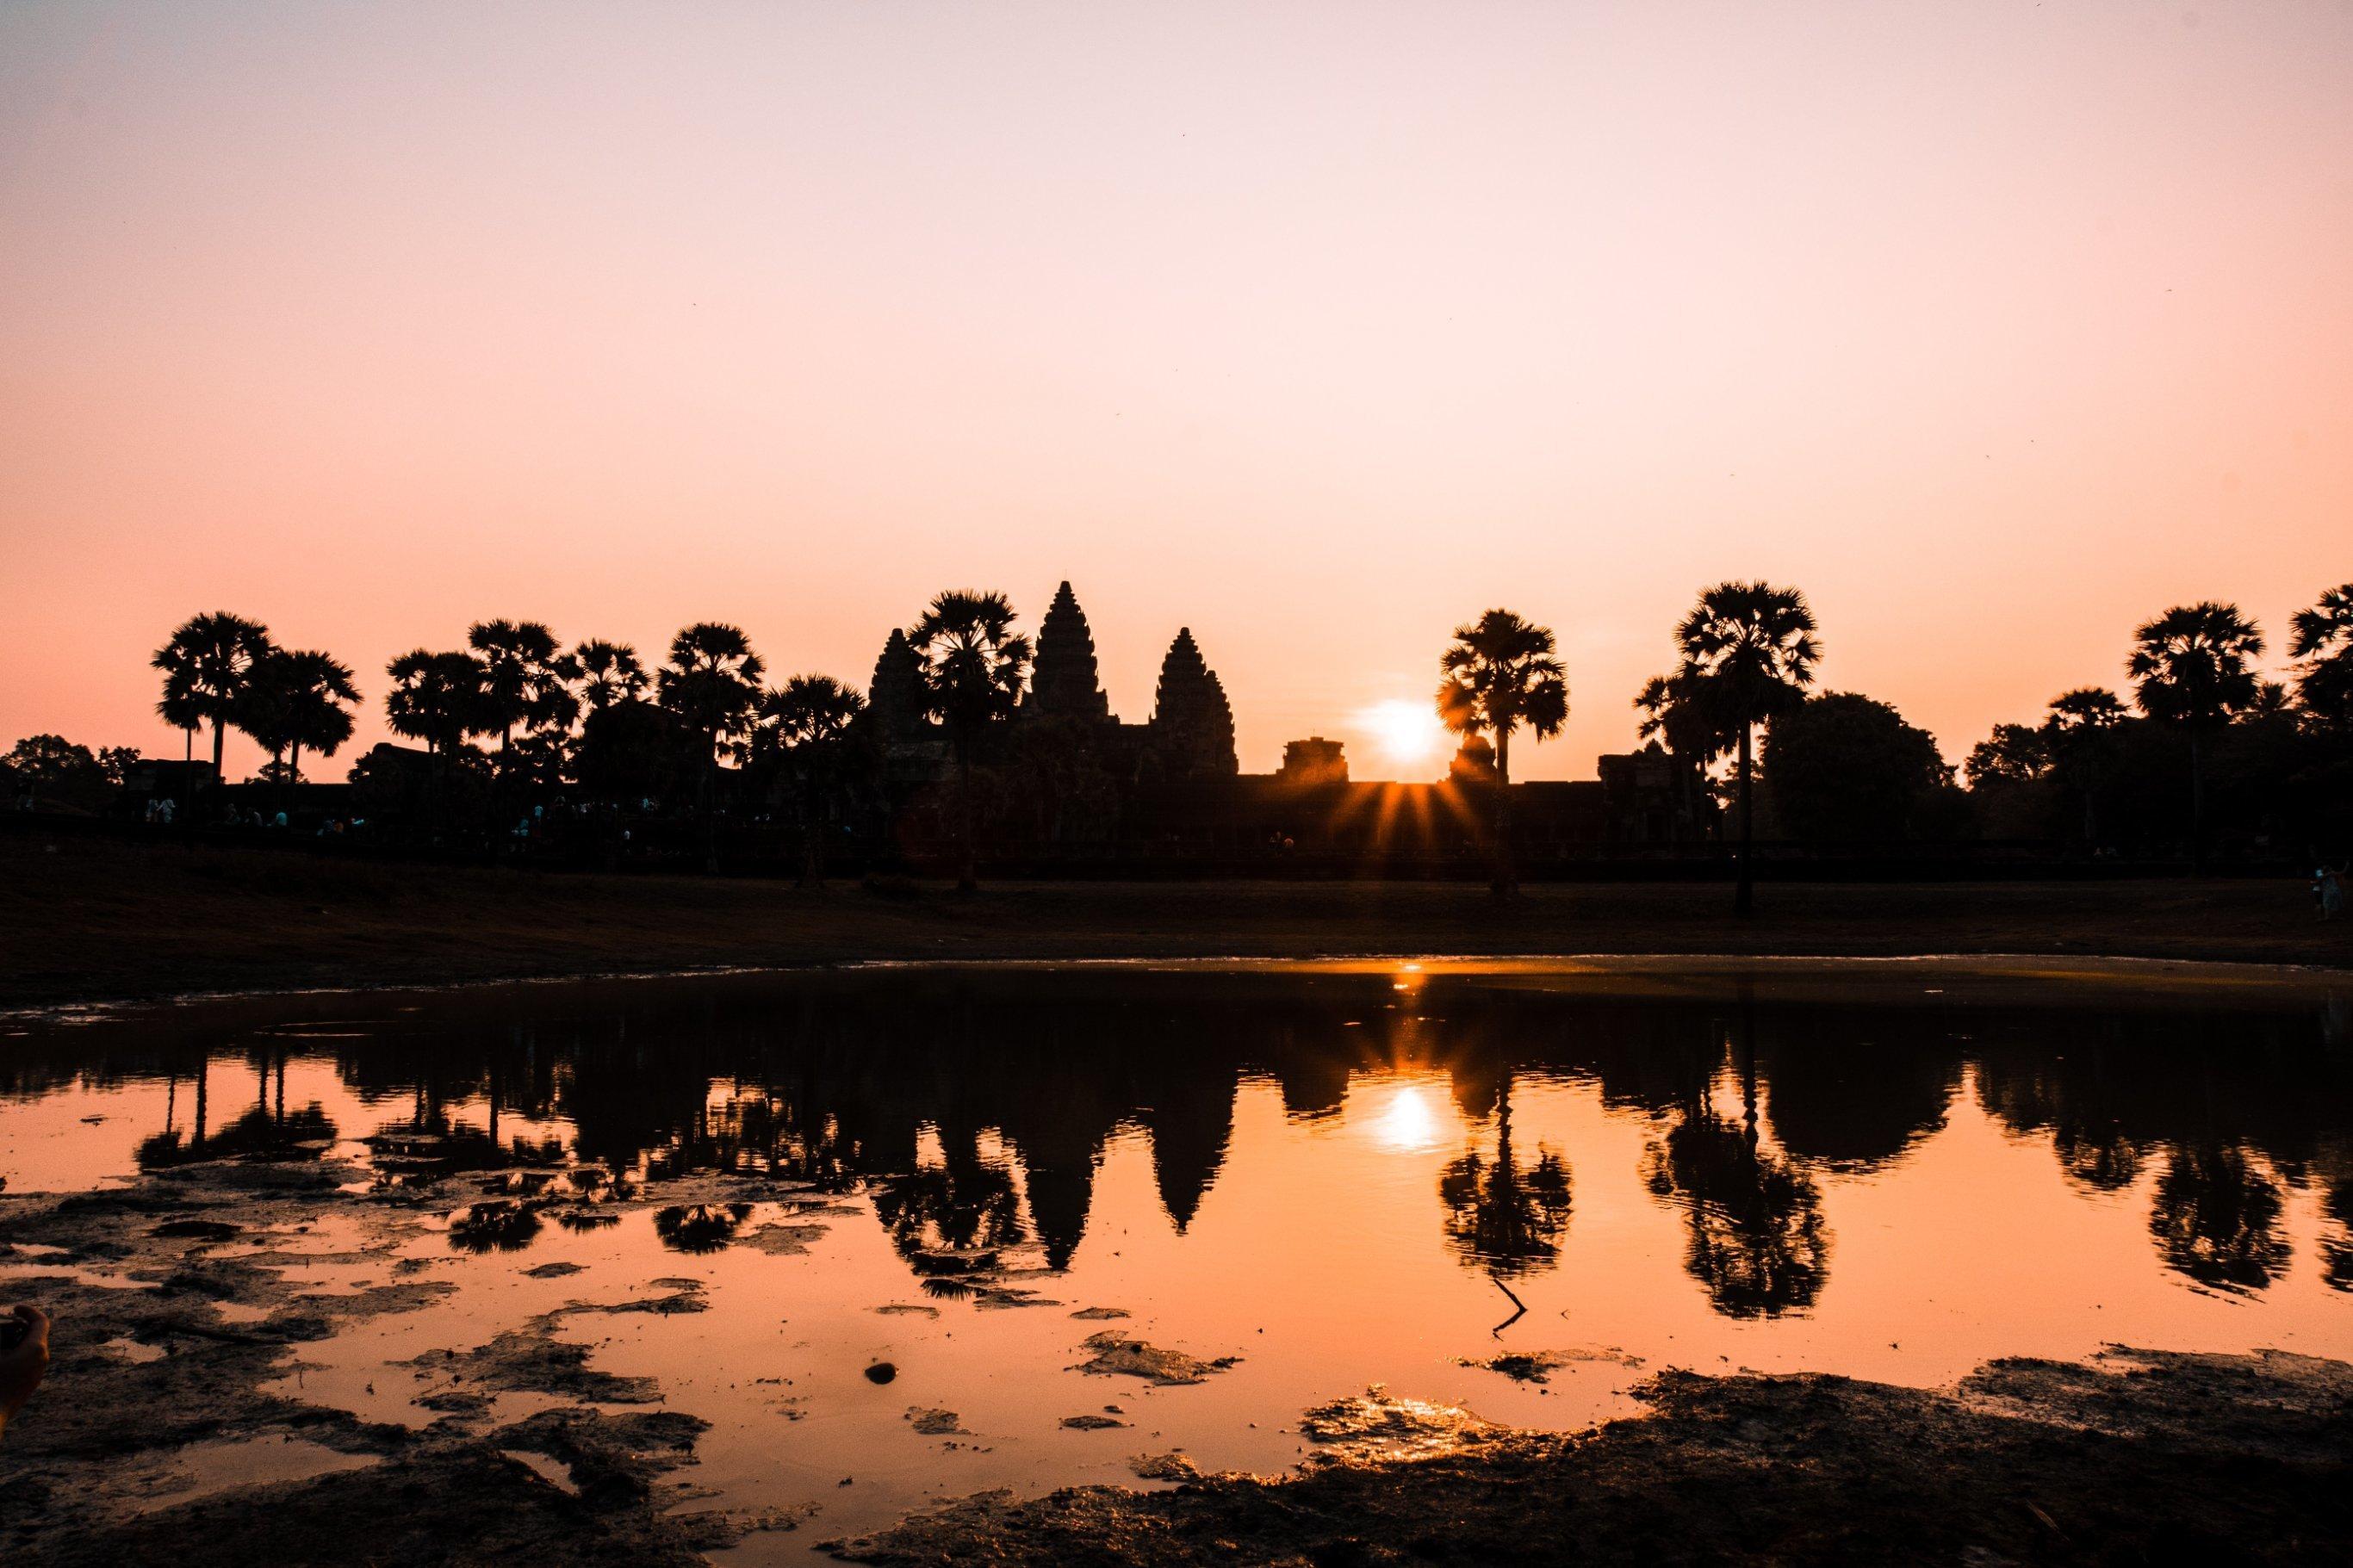 11-Day Vietnam and Cambodia Highlights - Vietnam and Cambodia Itinerary